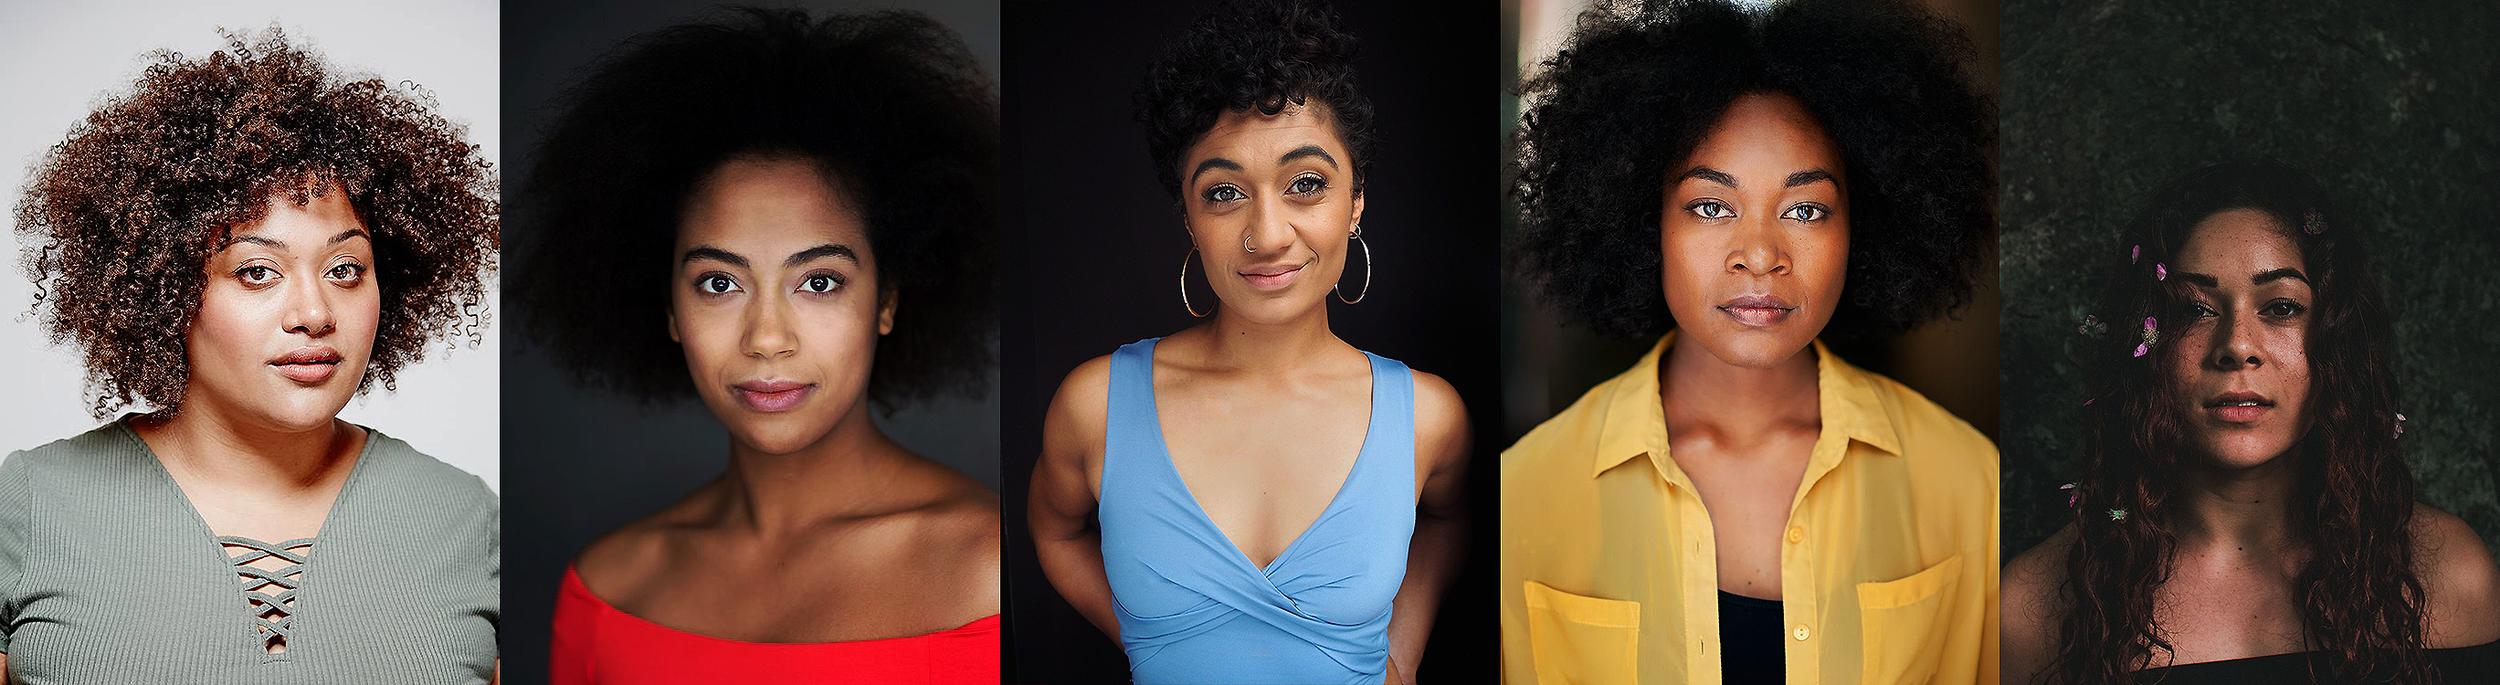 Brown Skin Girl cast members; Angela Sullen, Ayeesha Ash, Emily Havea, Assistant Director and Producer; Emele Ugavele, and Choreographer; Sela Vai